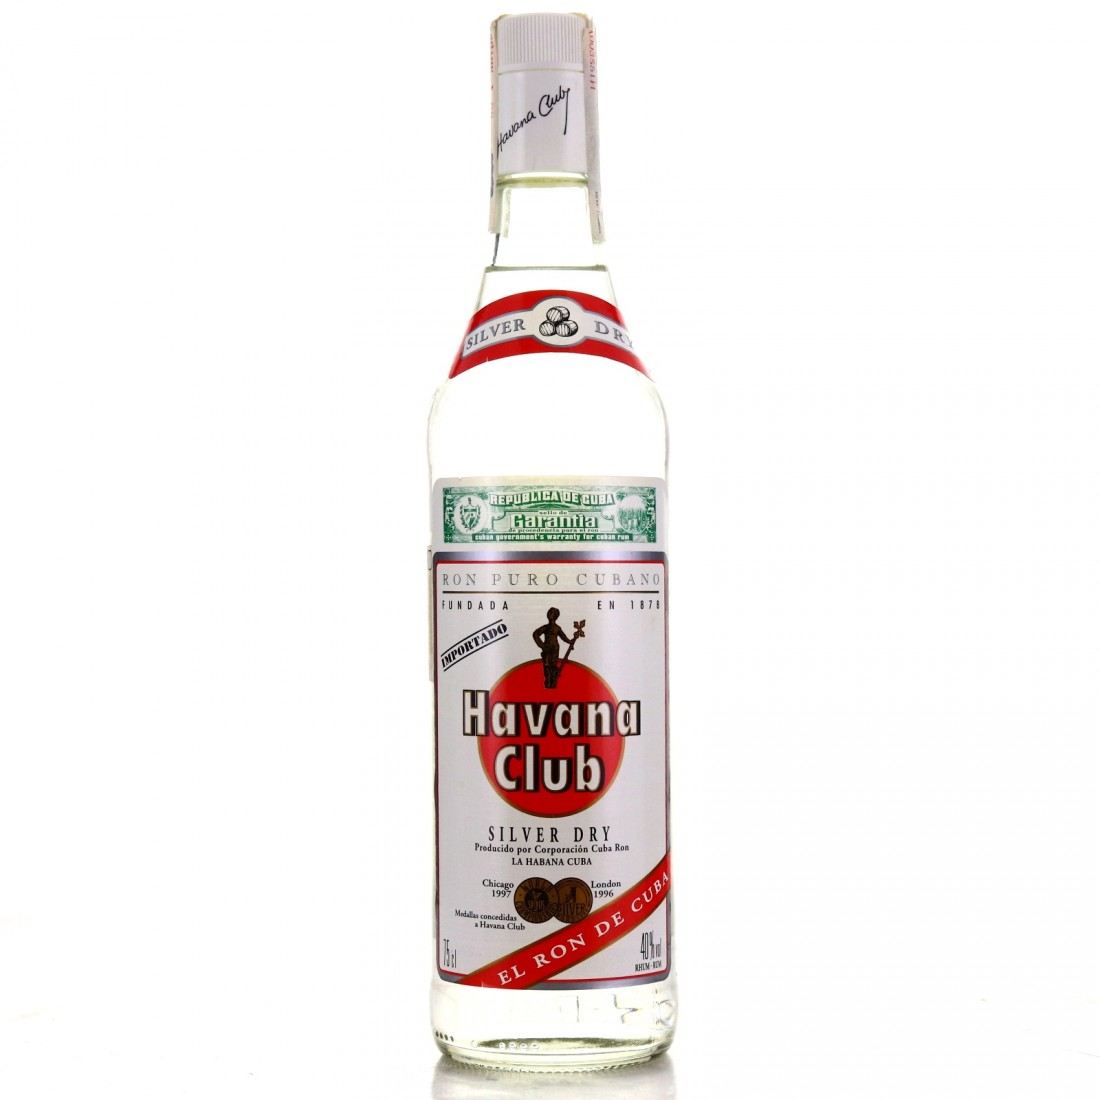 Havana Club Silver Dry